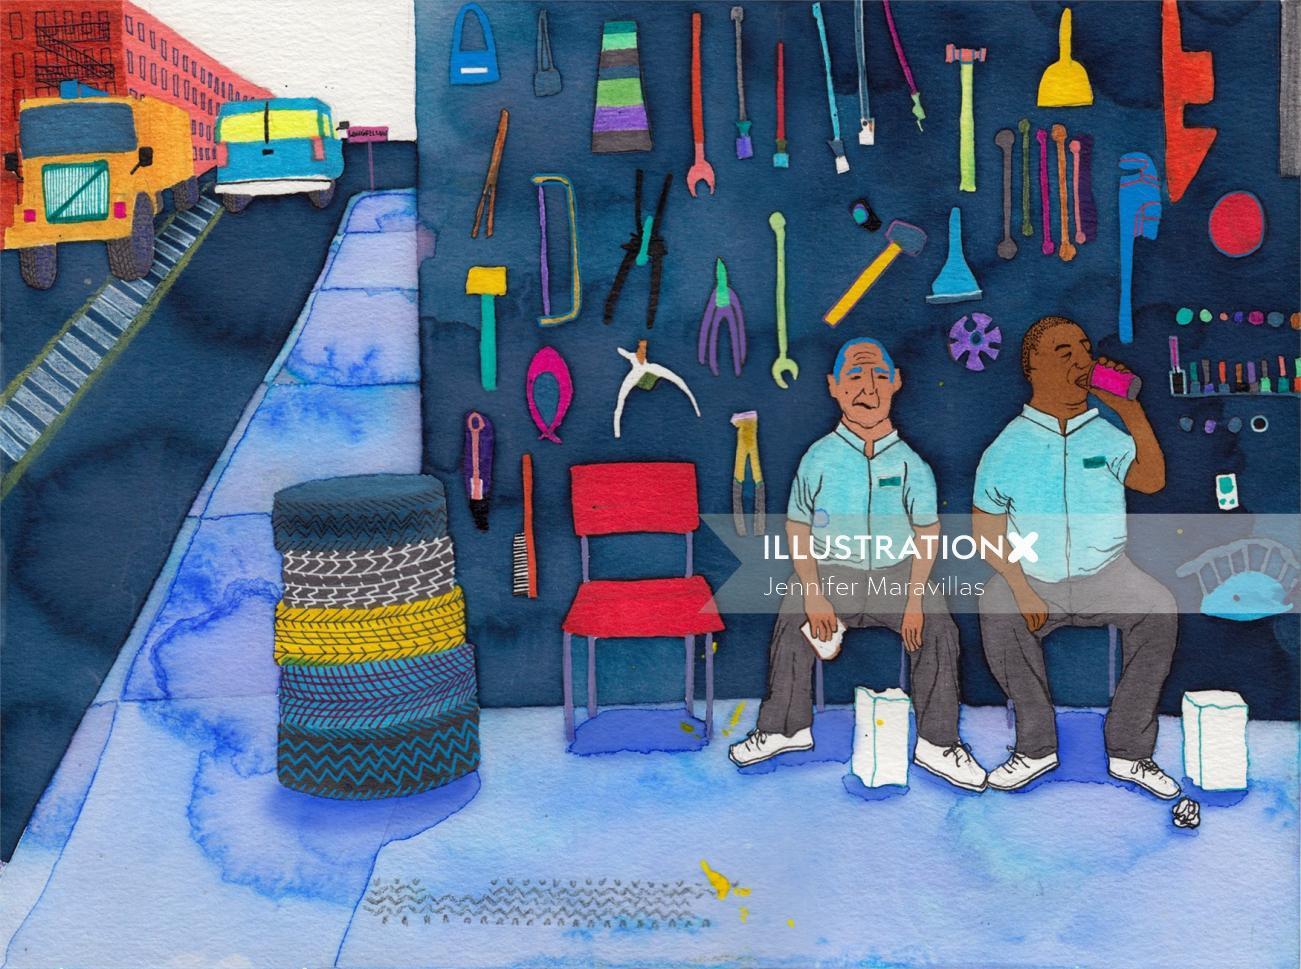 An illustration of motor technicians